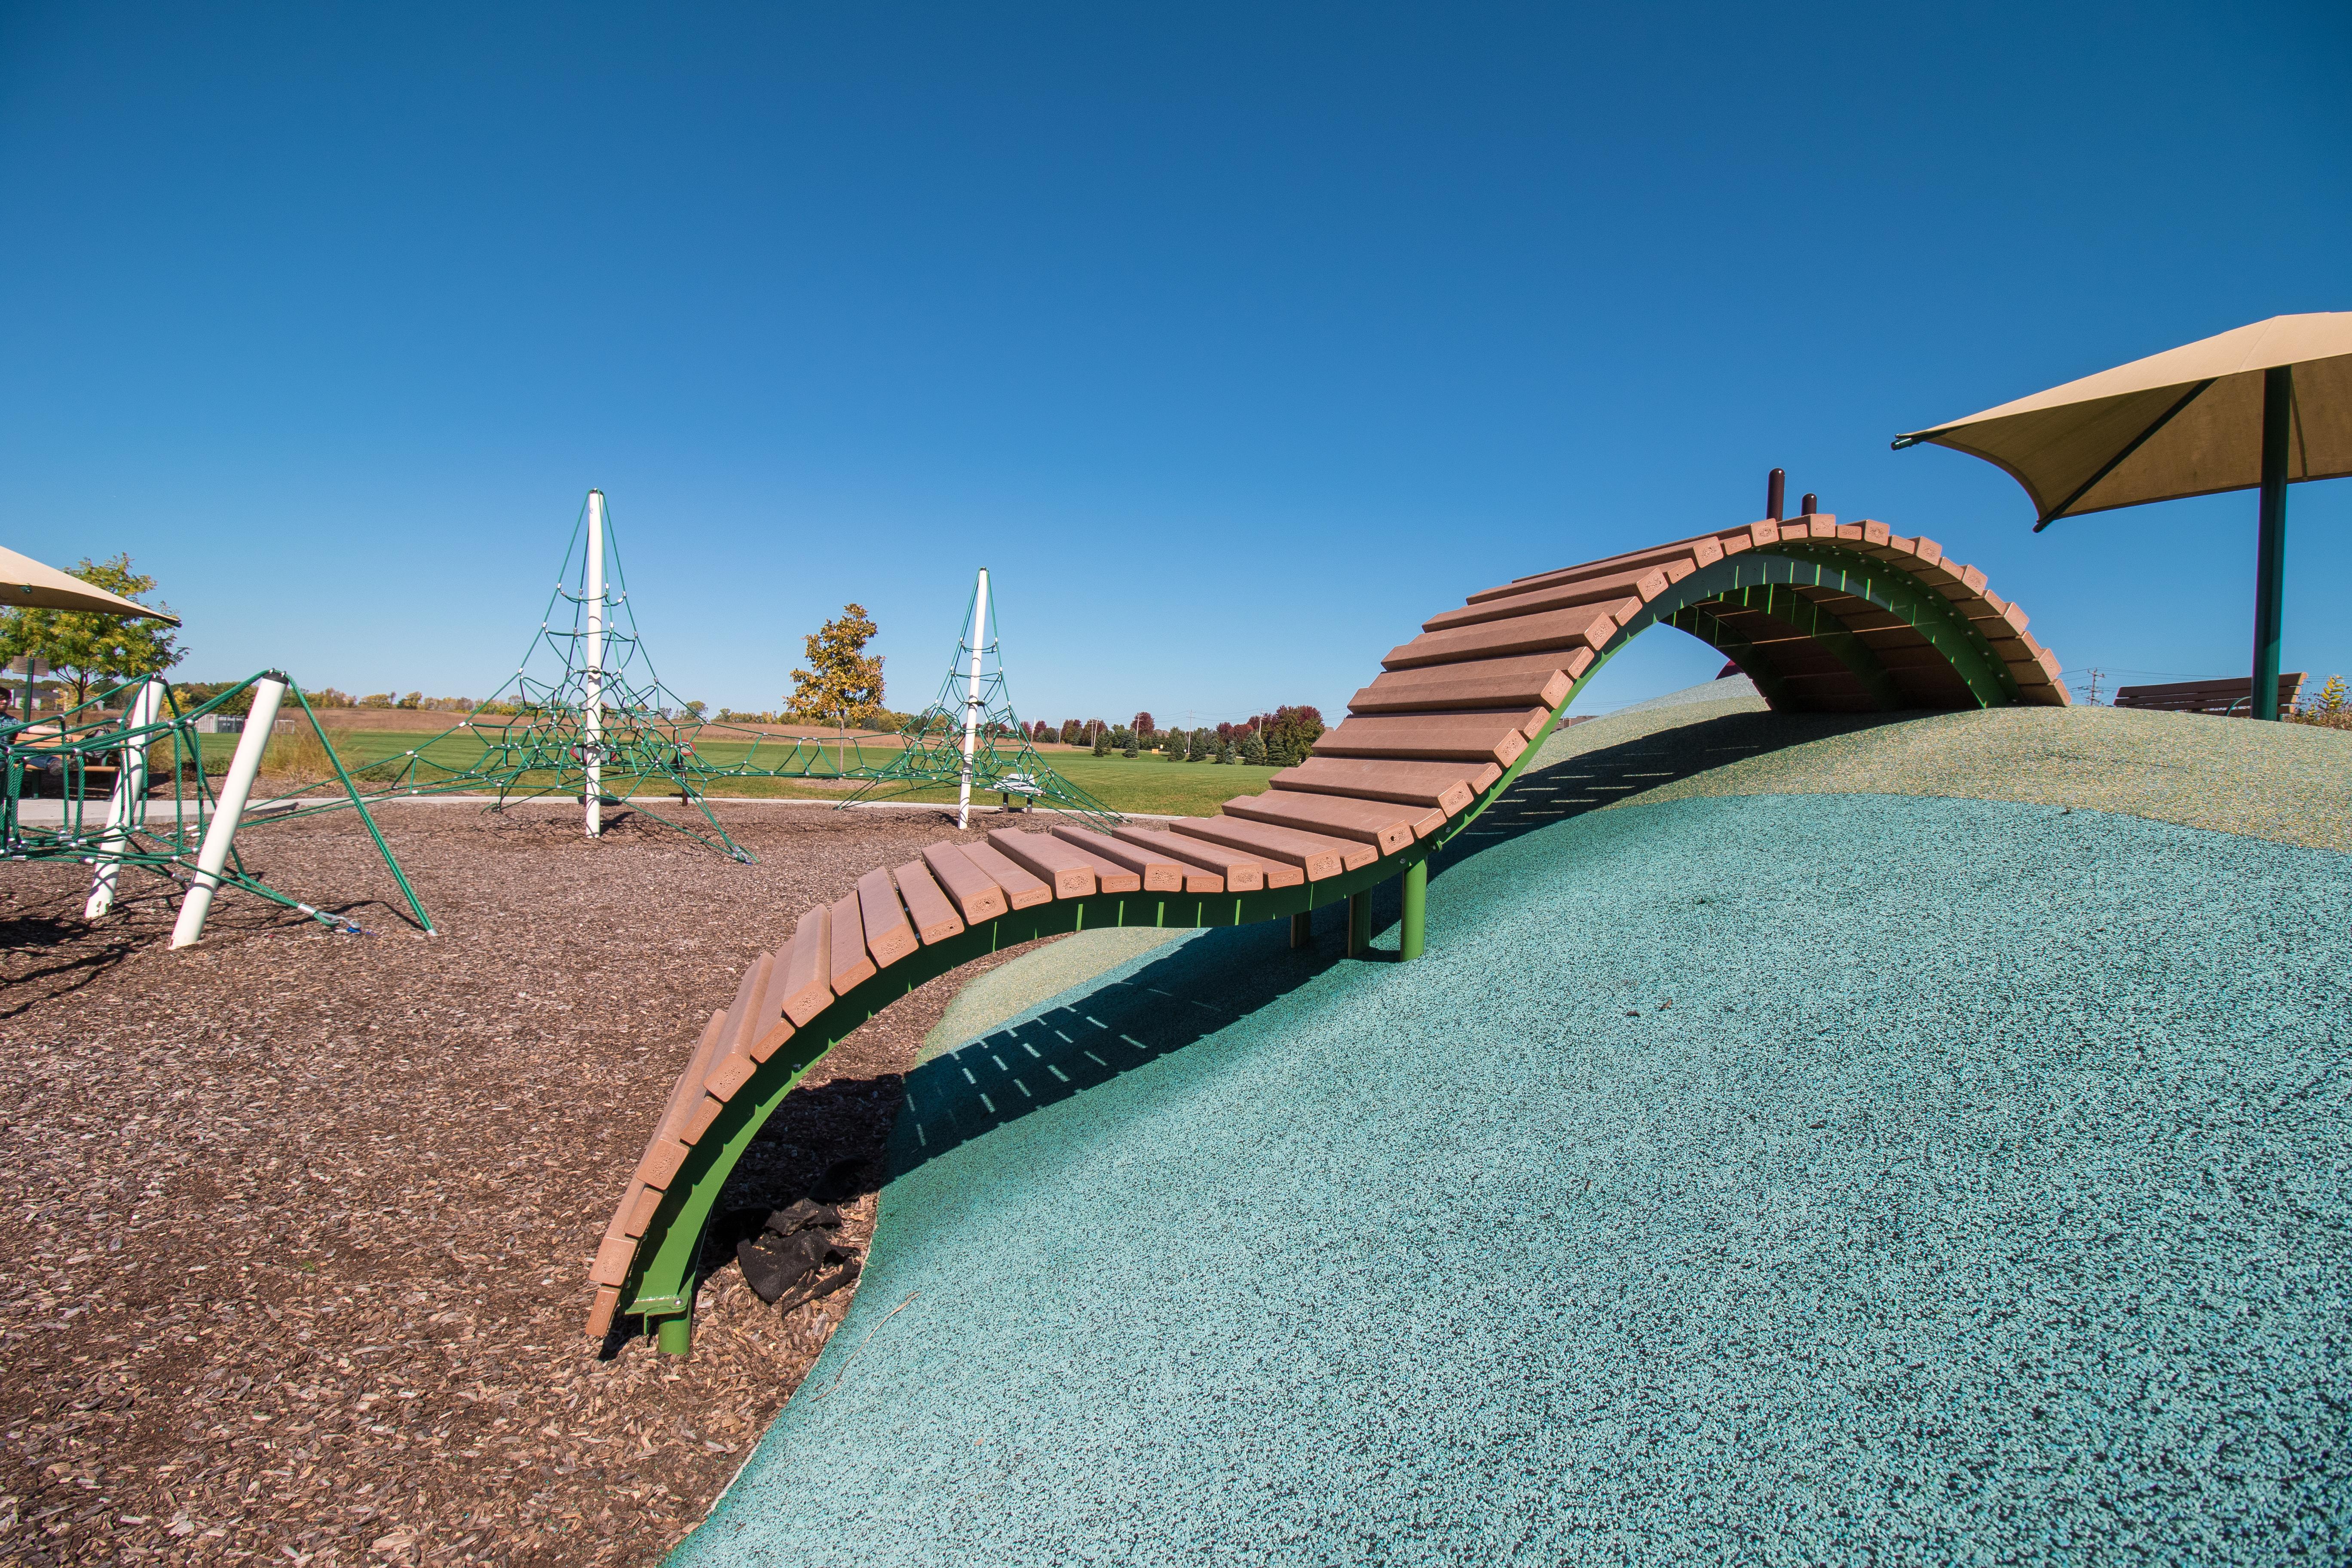 Peck Farm North - Playground